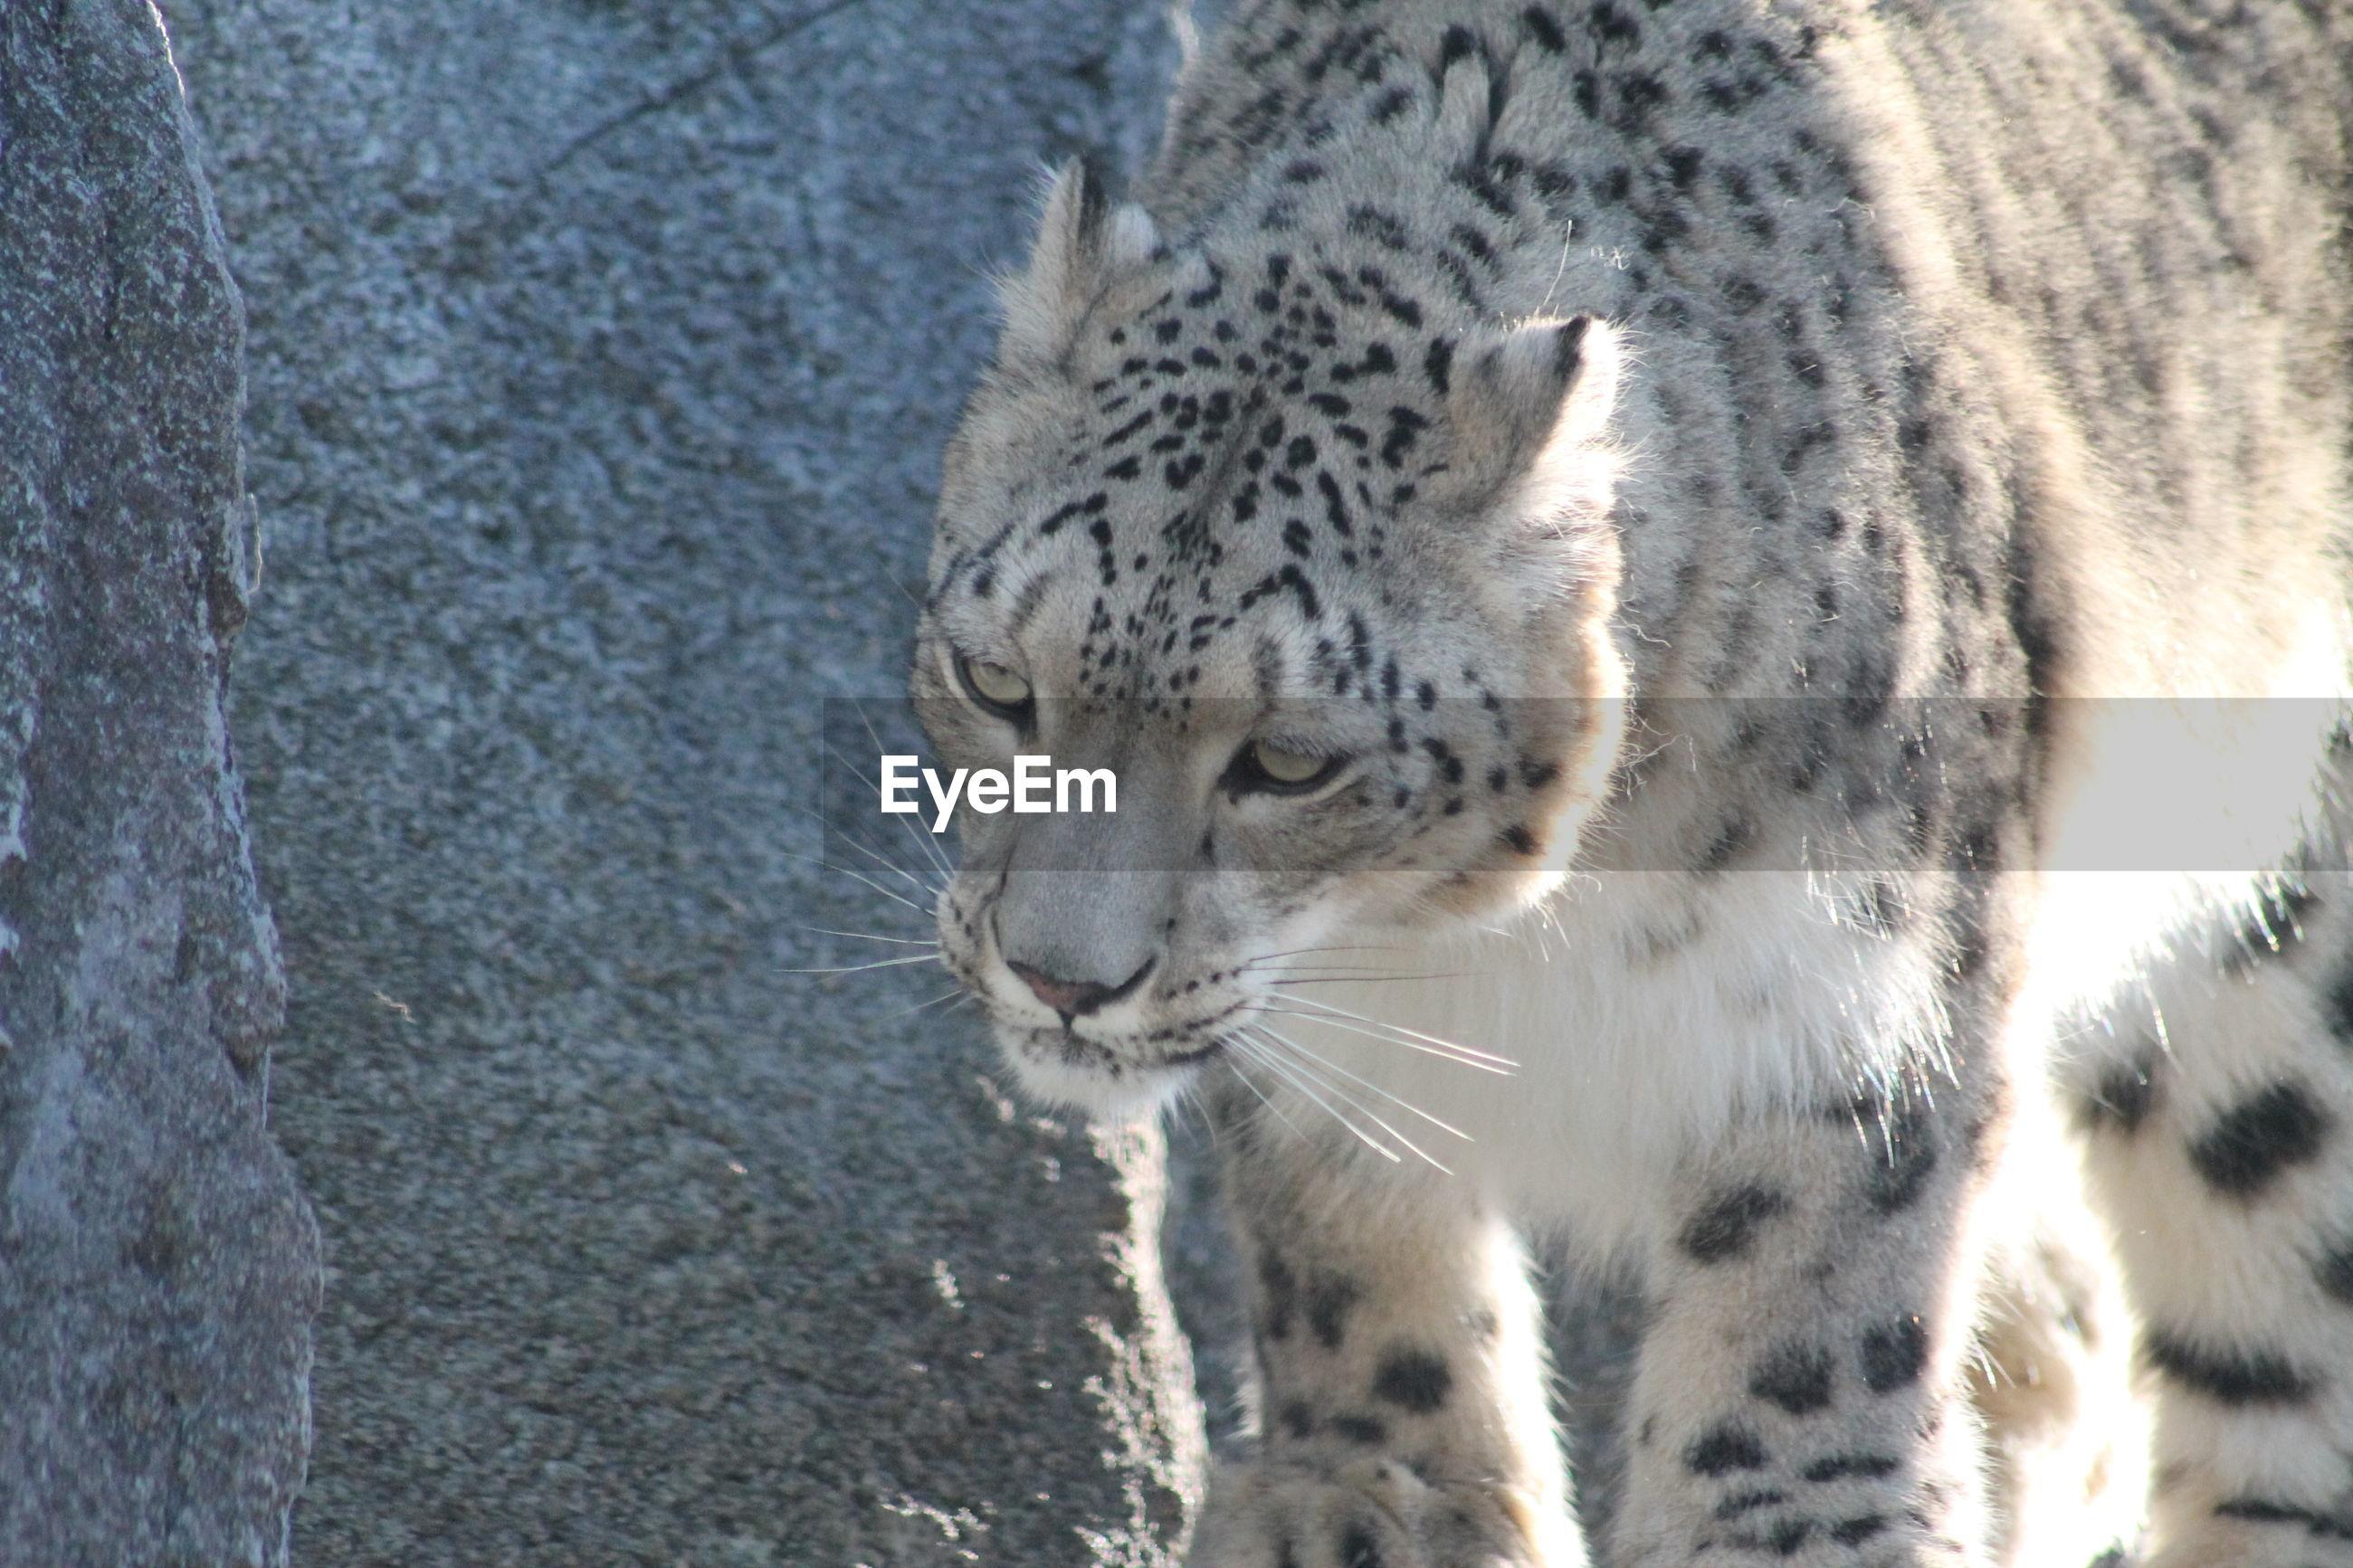 Close-up of a snow leopard